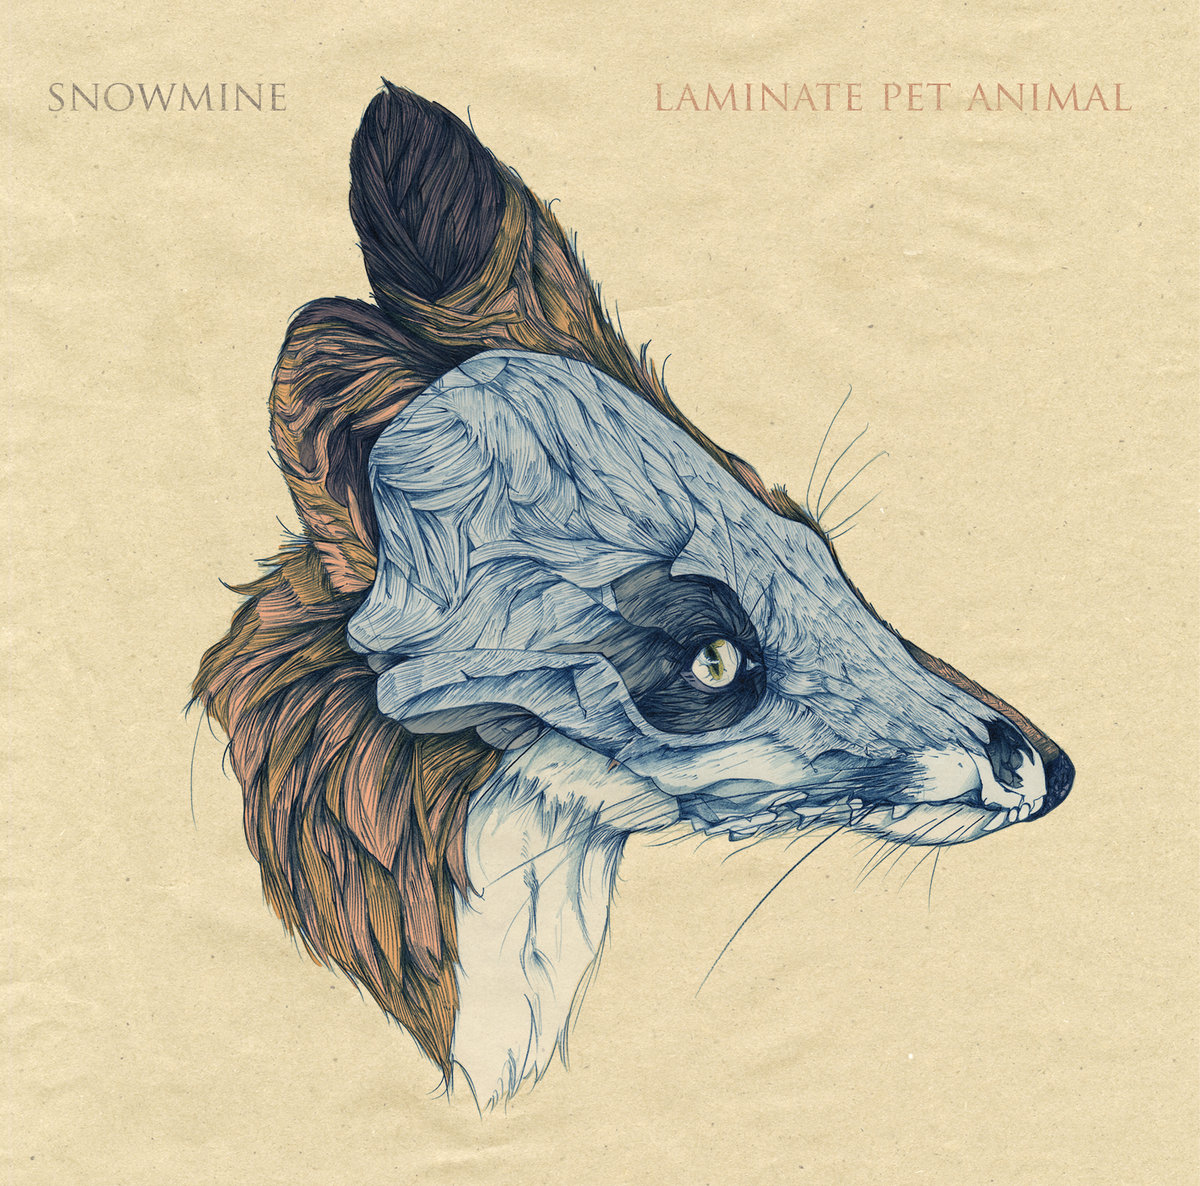 Snowmine - Laminate Pet Animal